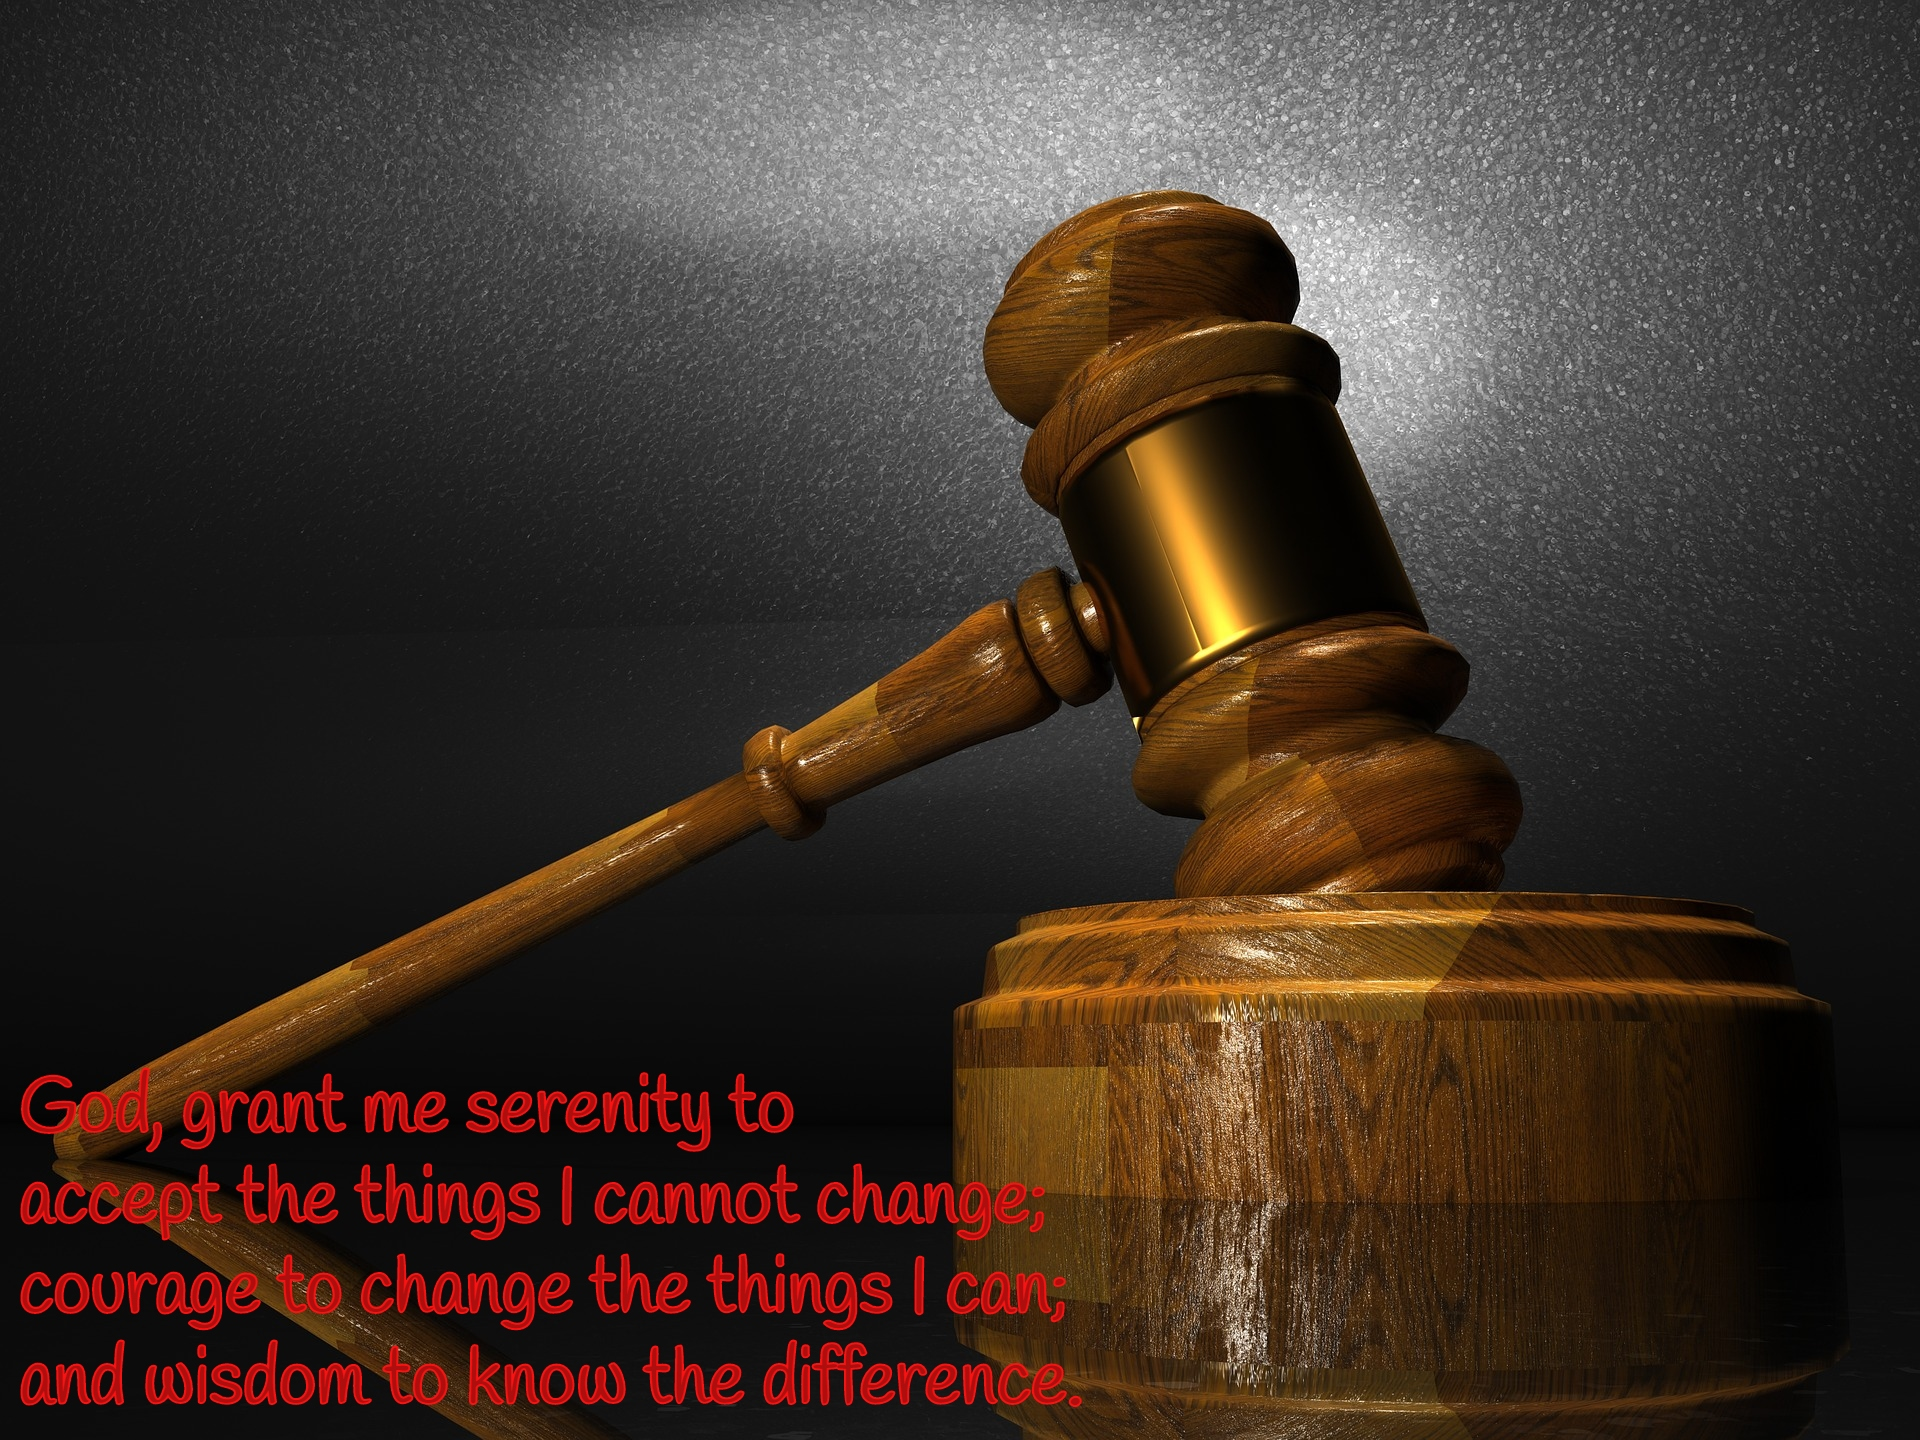 law-1063249_1920 (1)